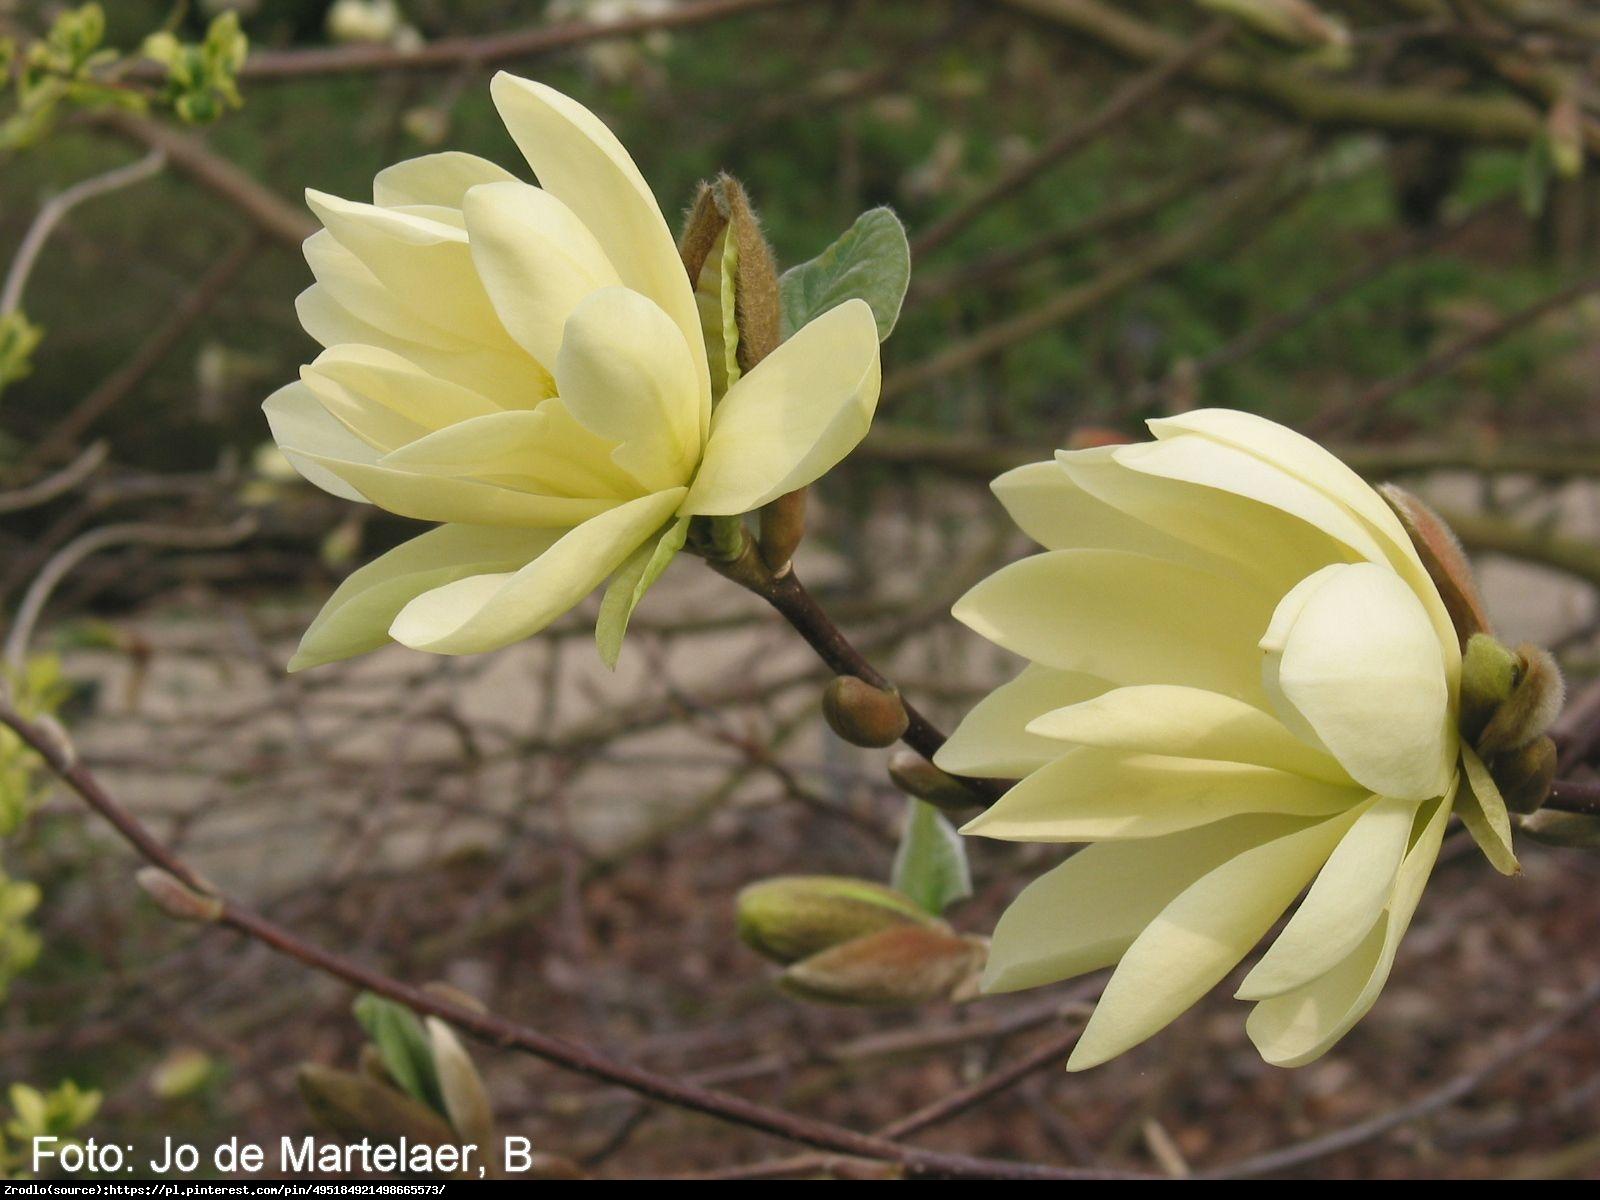 Magnolia drzewiasta - drzewo ogórkowe - Magnolia acuminata